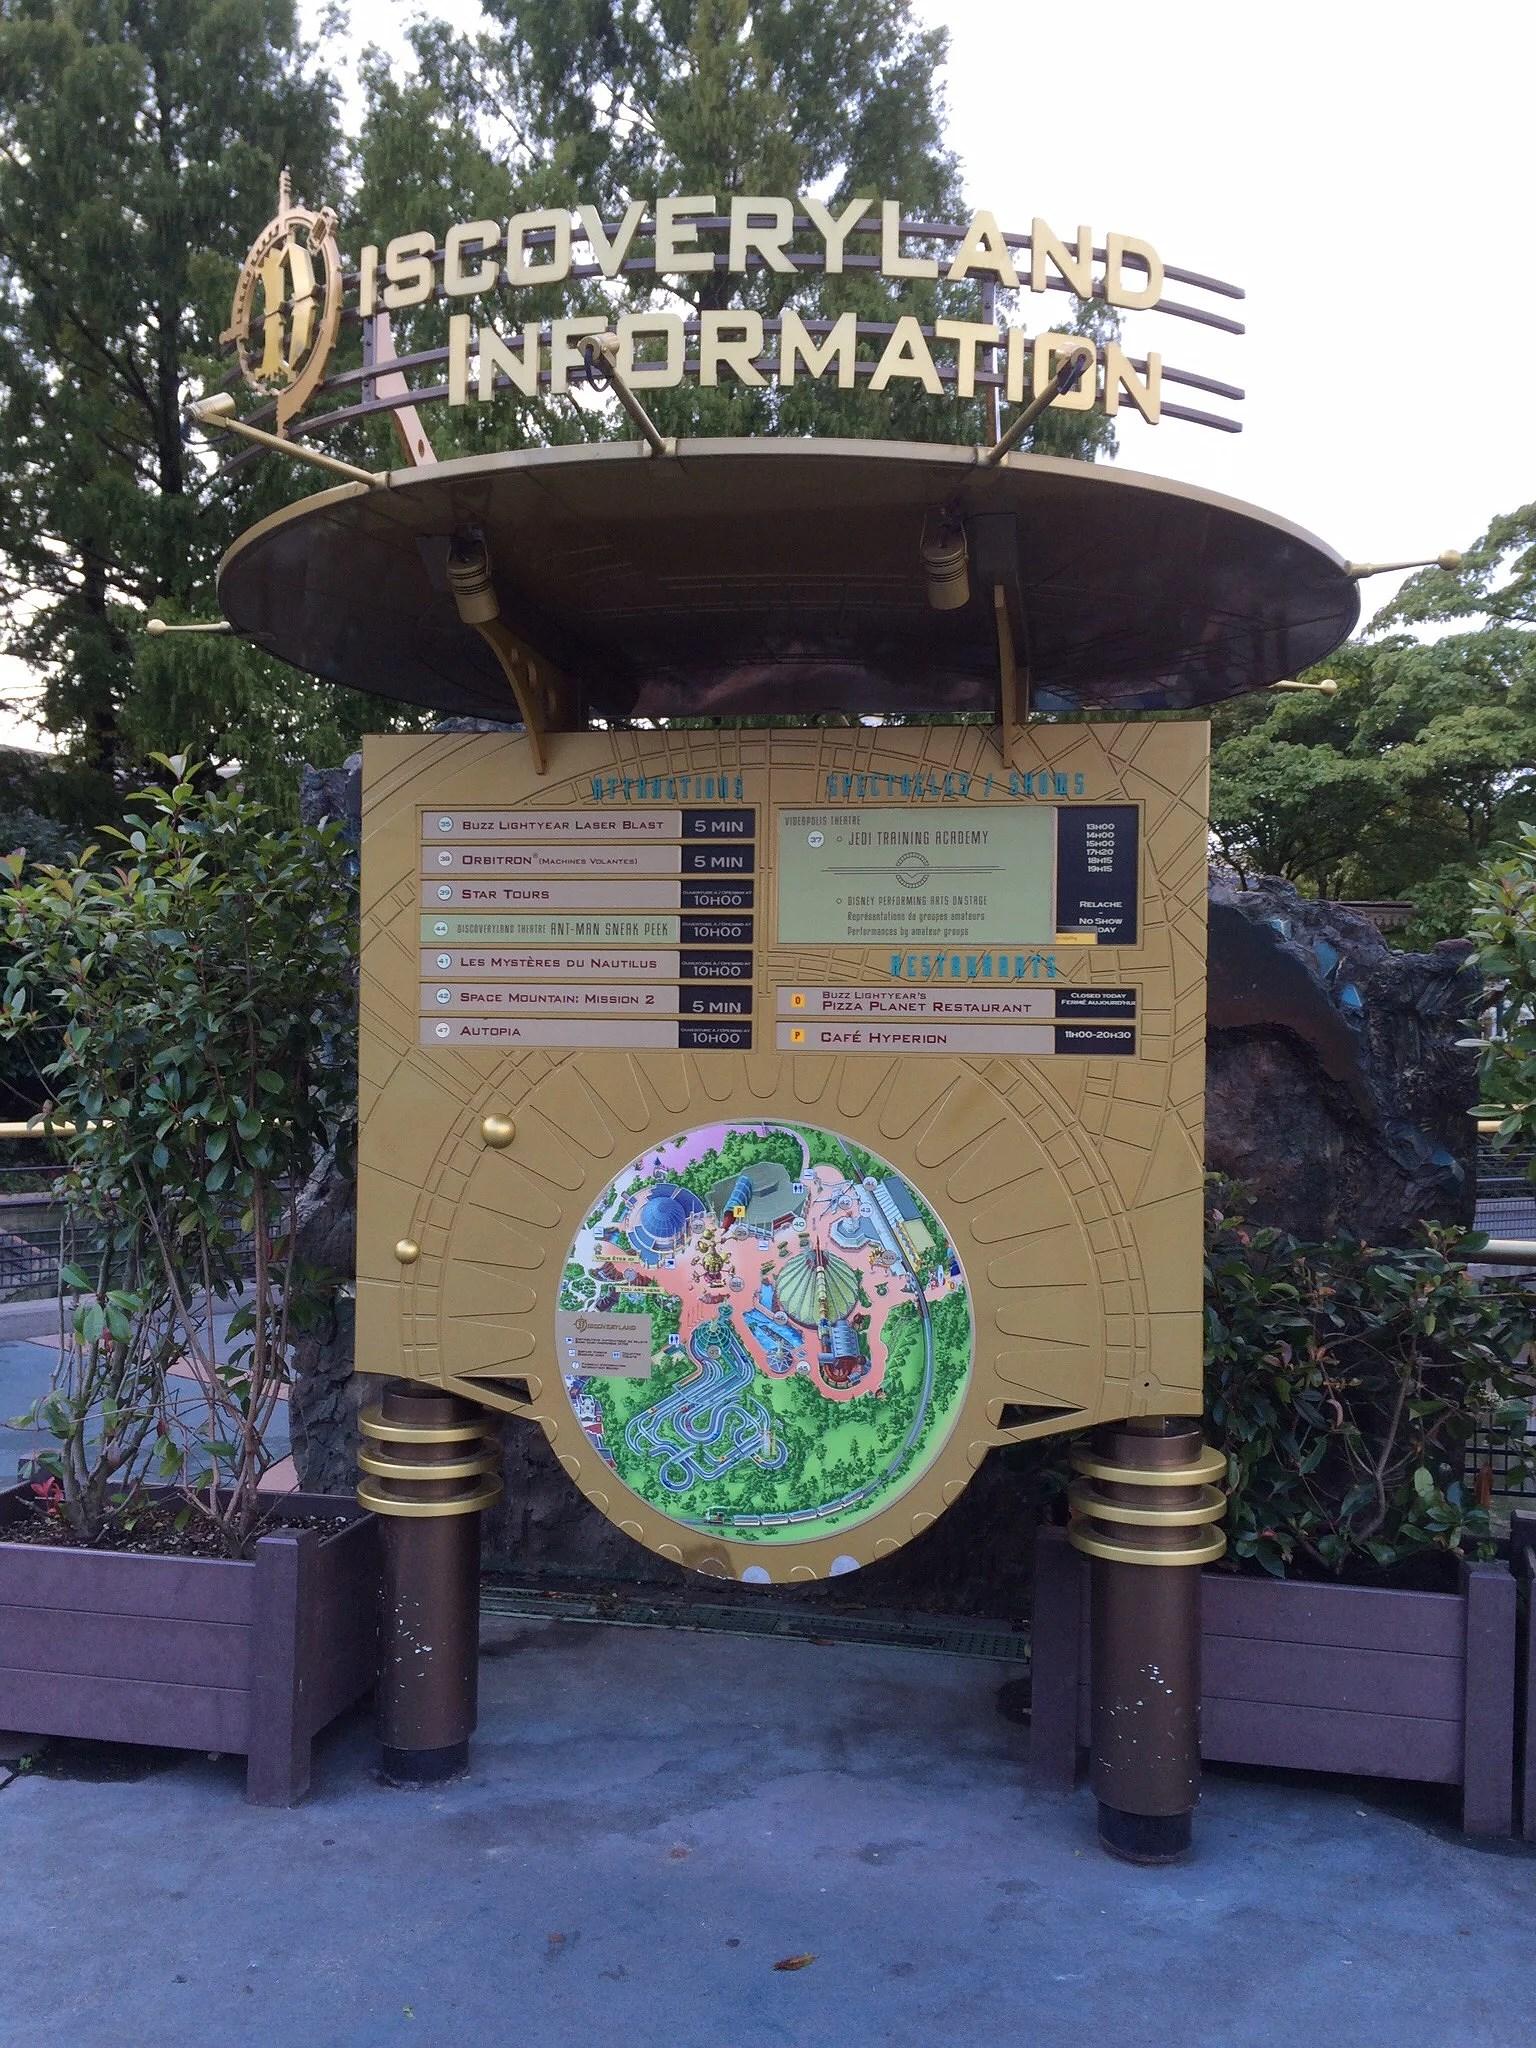 Baby Care Centers på Disneyland Paris